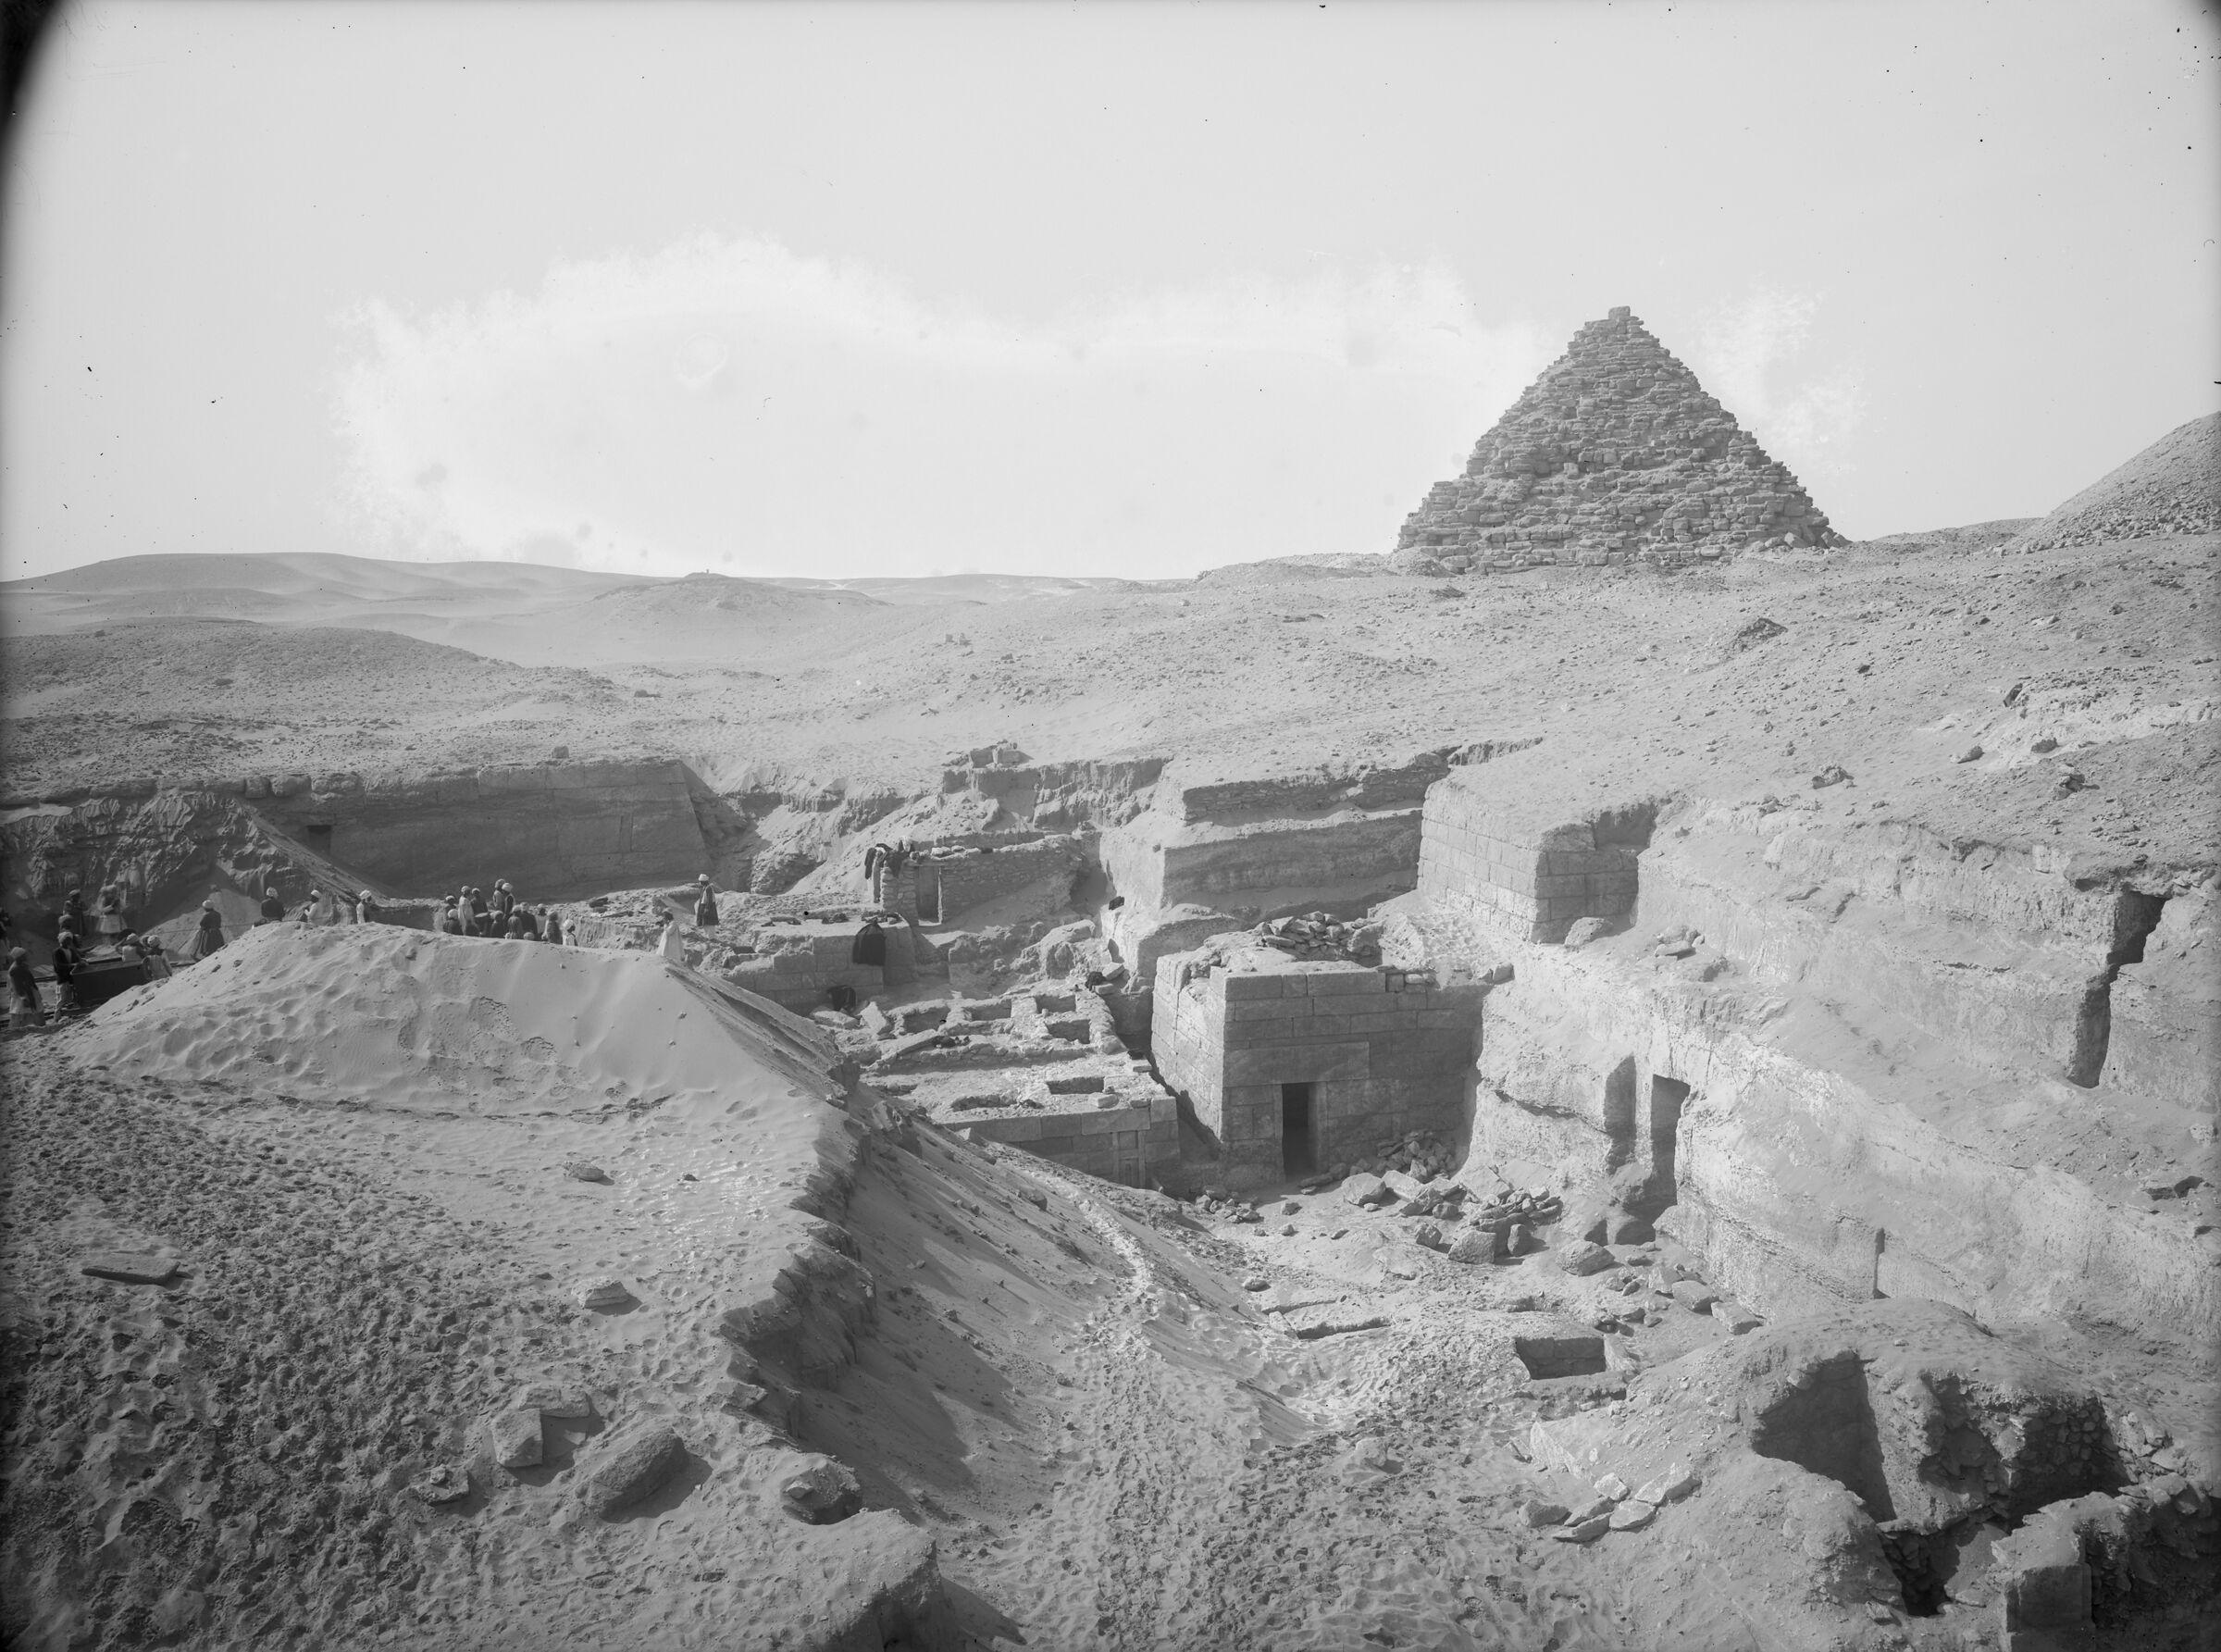 Menkaure Quarry Cemetery: Site: Giza; View: MQ 105, MQ 121, MQ 120, MQ 132, MQ 133, MQ 134, MQ 135, MQ 106